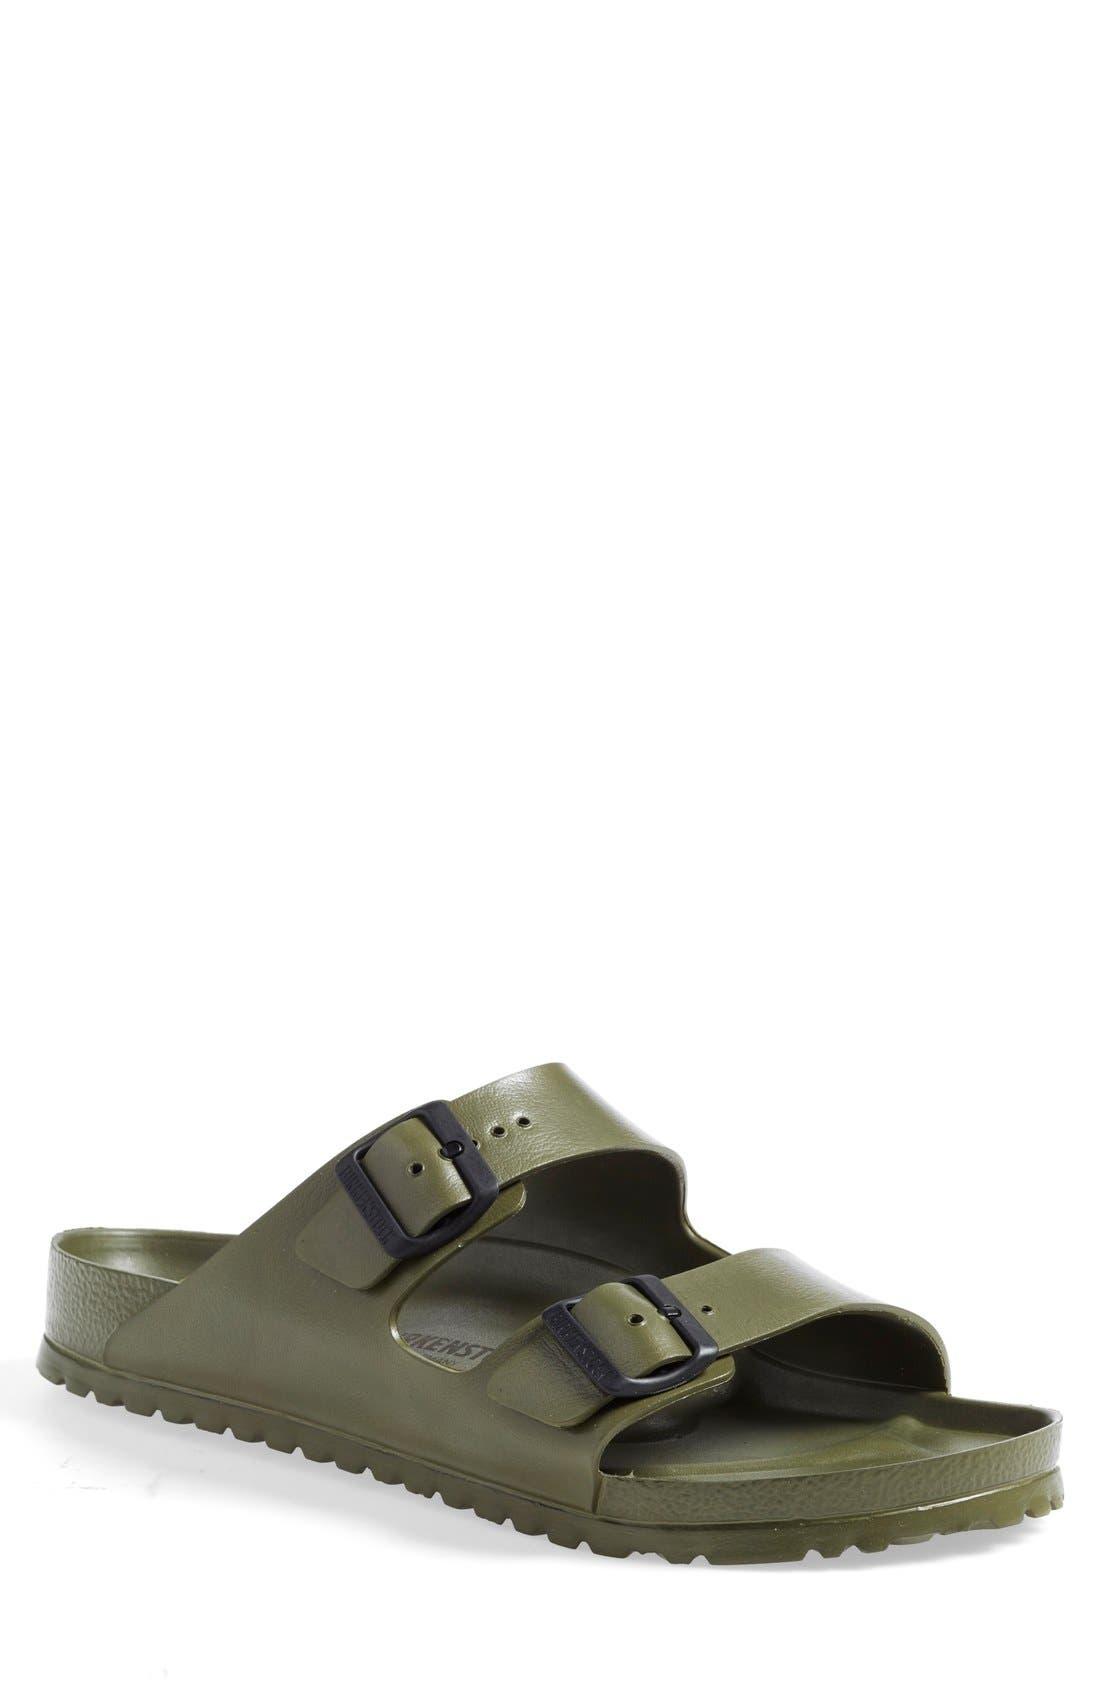 'Essentials - Arizona EVA' Waterproof Slide Sandal,                             Main thumbnail 1, color,                             GREEN